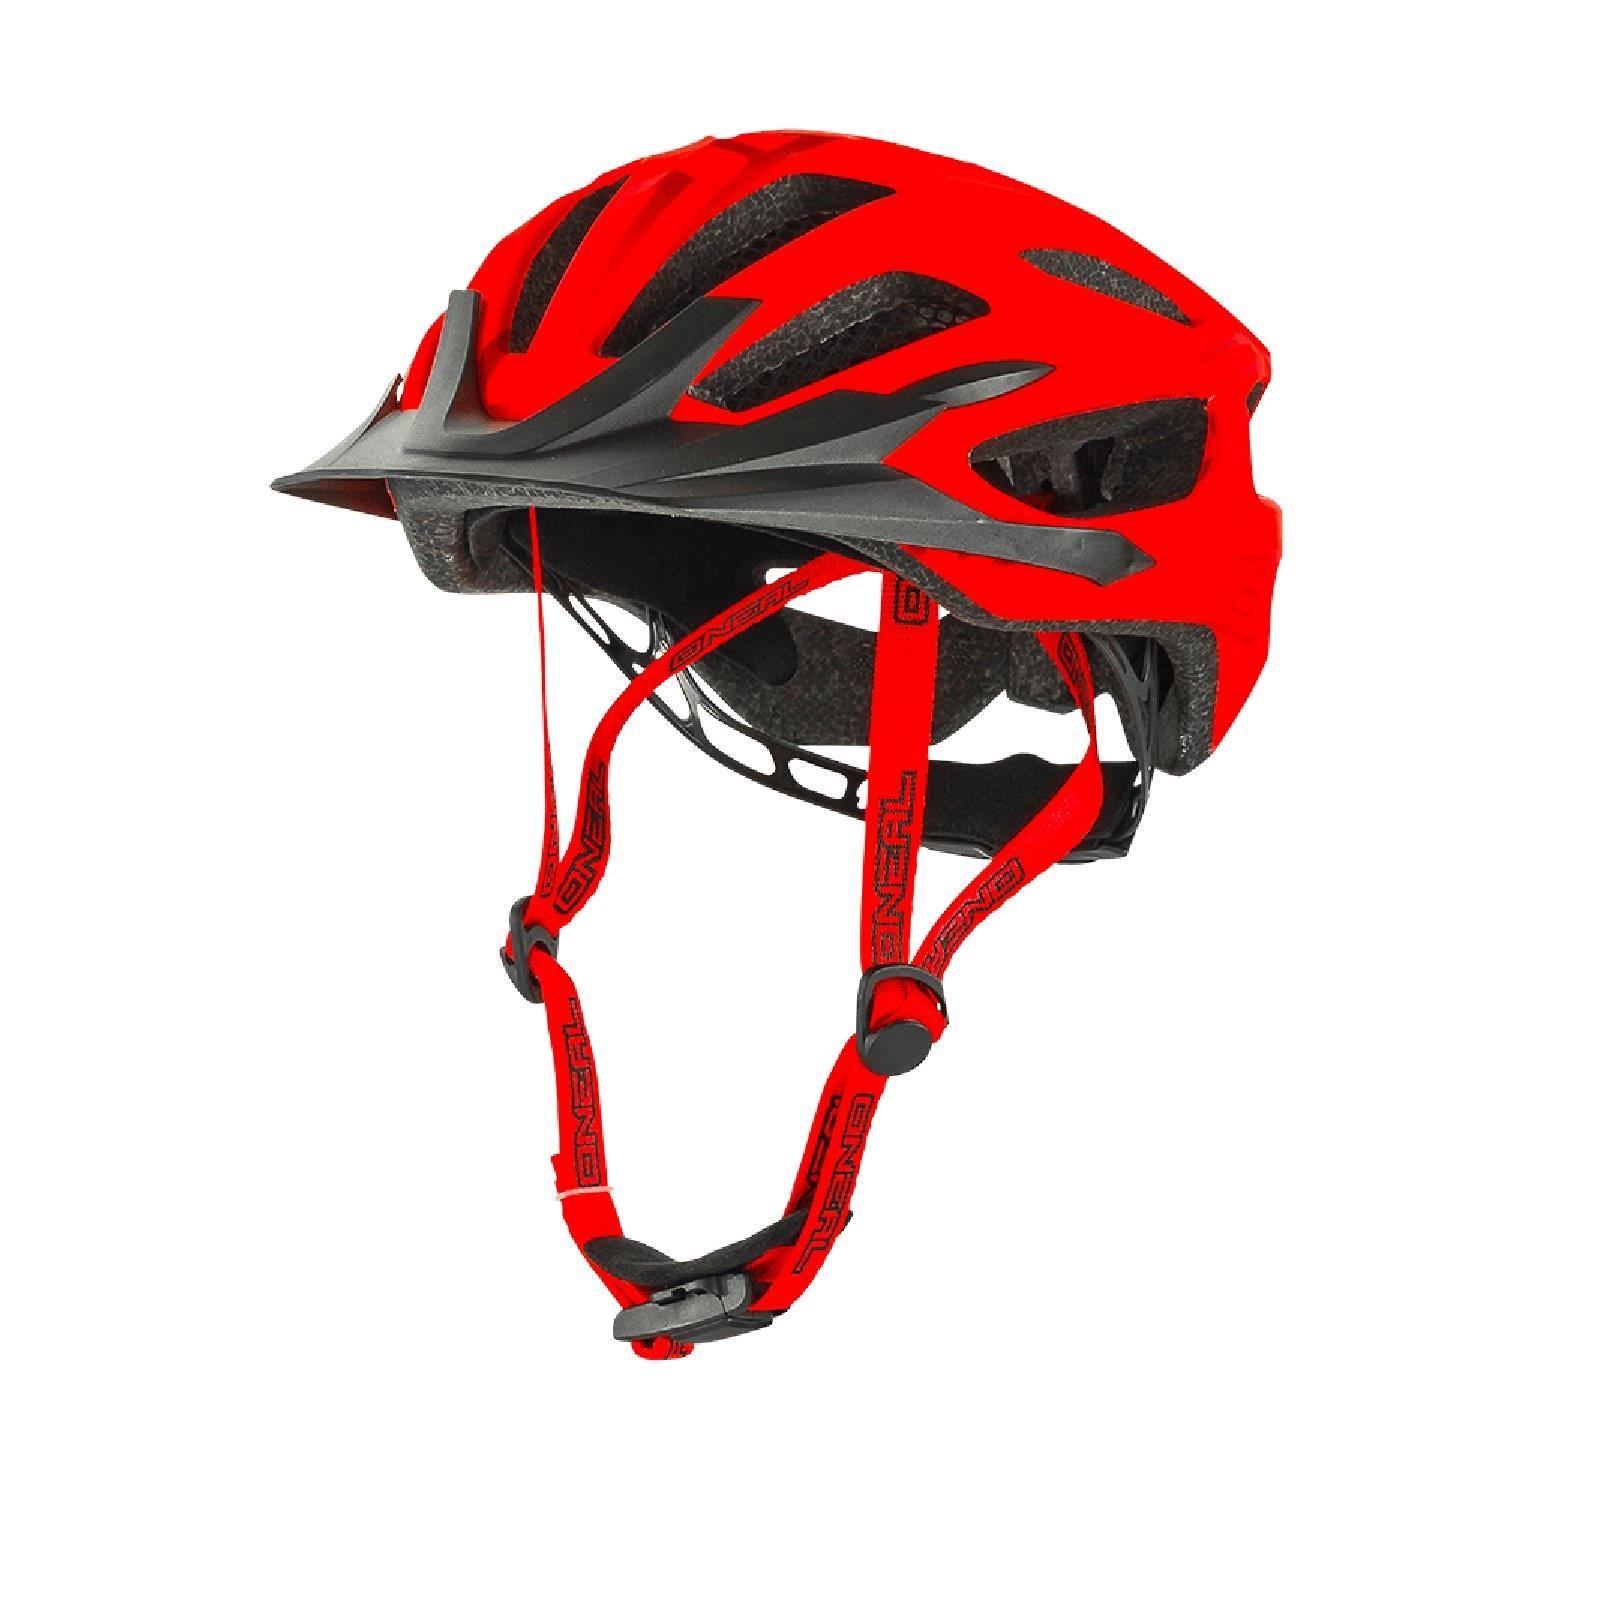 oneal q rl helm mtb rot all mountain bike enduro trail. Black Bedroom Furniture Sets. Home Design Ideas